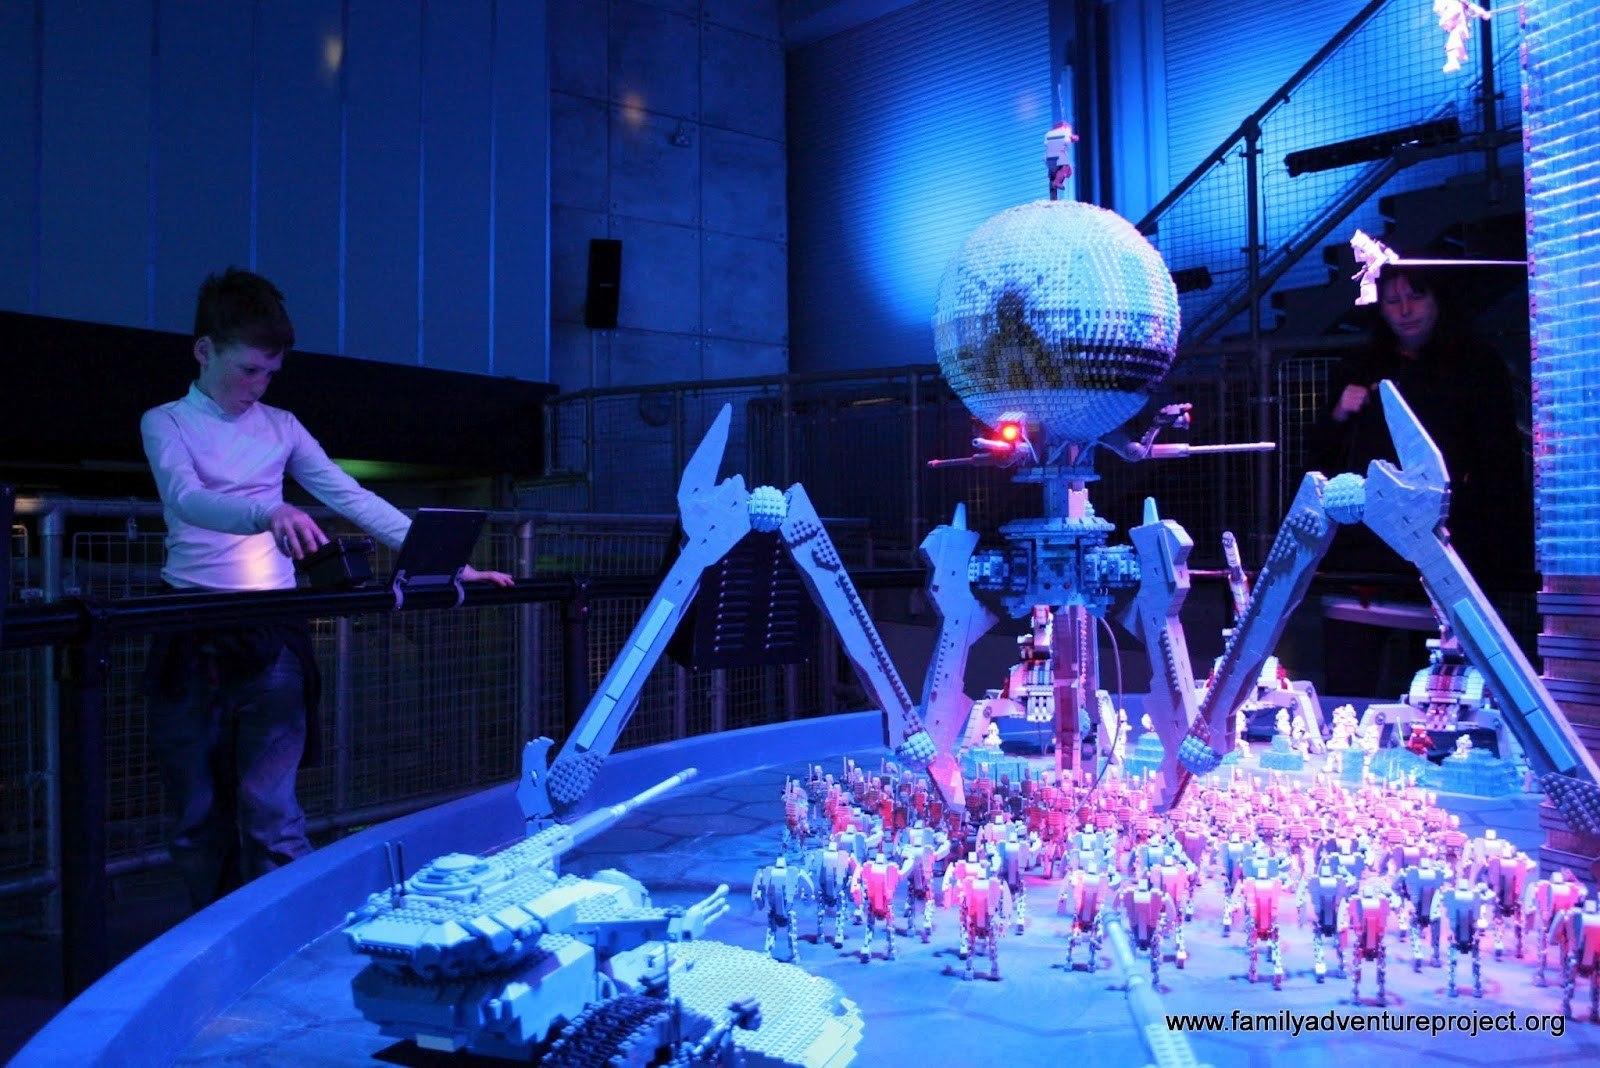 Star Wars Miniland at Legoland Windsor